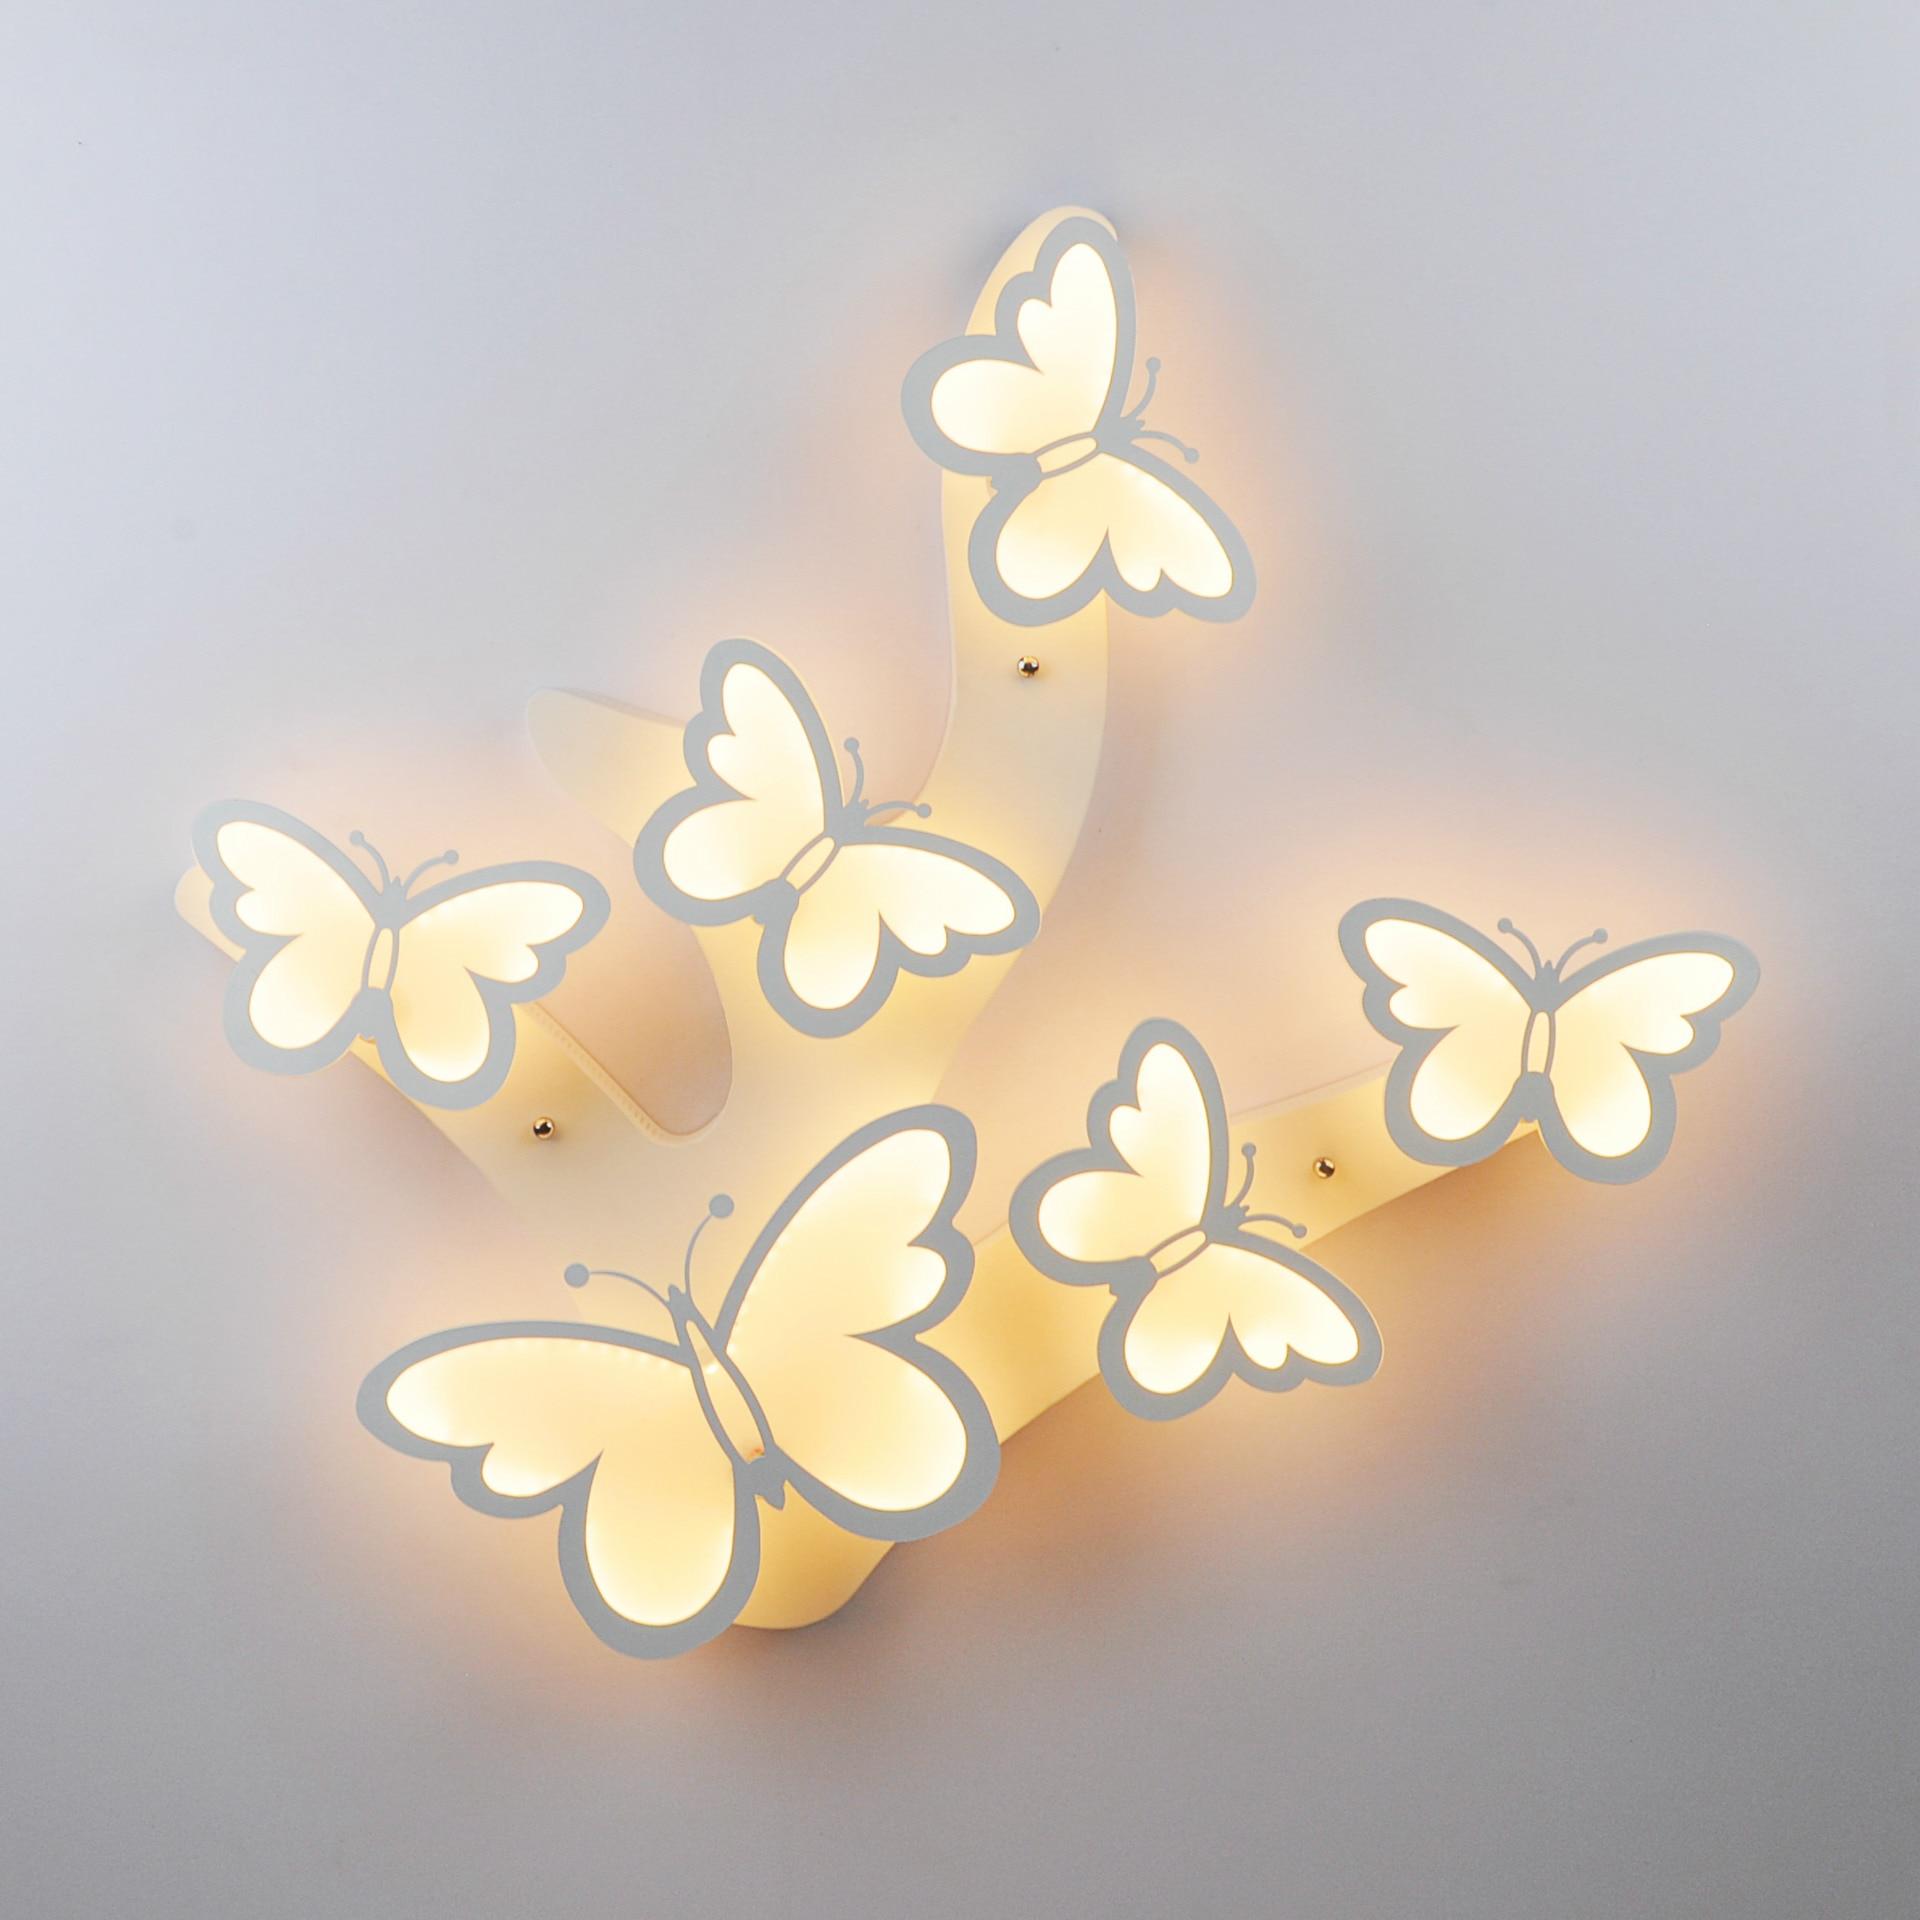 Modern Simple Butterfly Avize Led Ceiling Lights Children Living Room Bedroom Dinning Room Ceiling Lamp Home Deco Plafondlamp